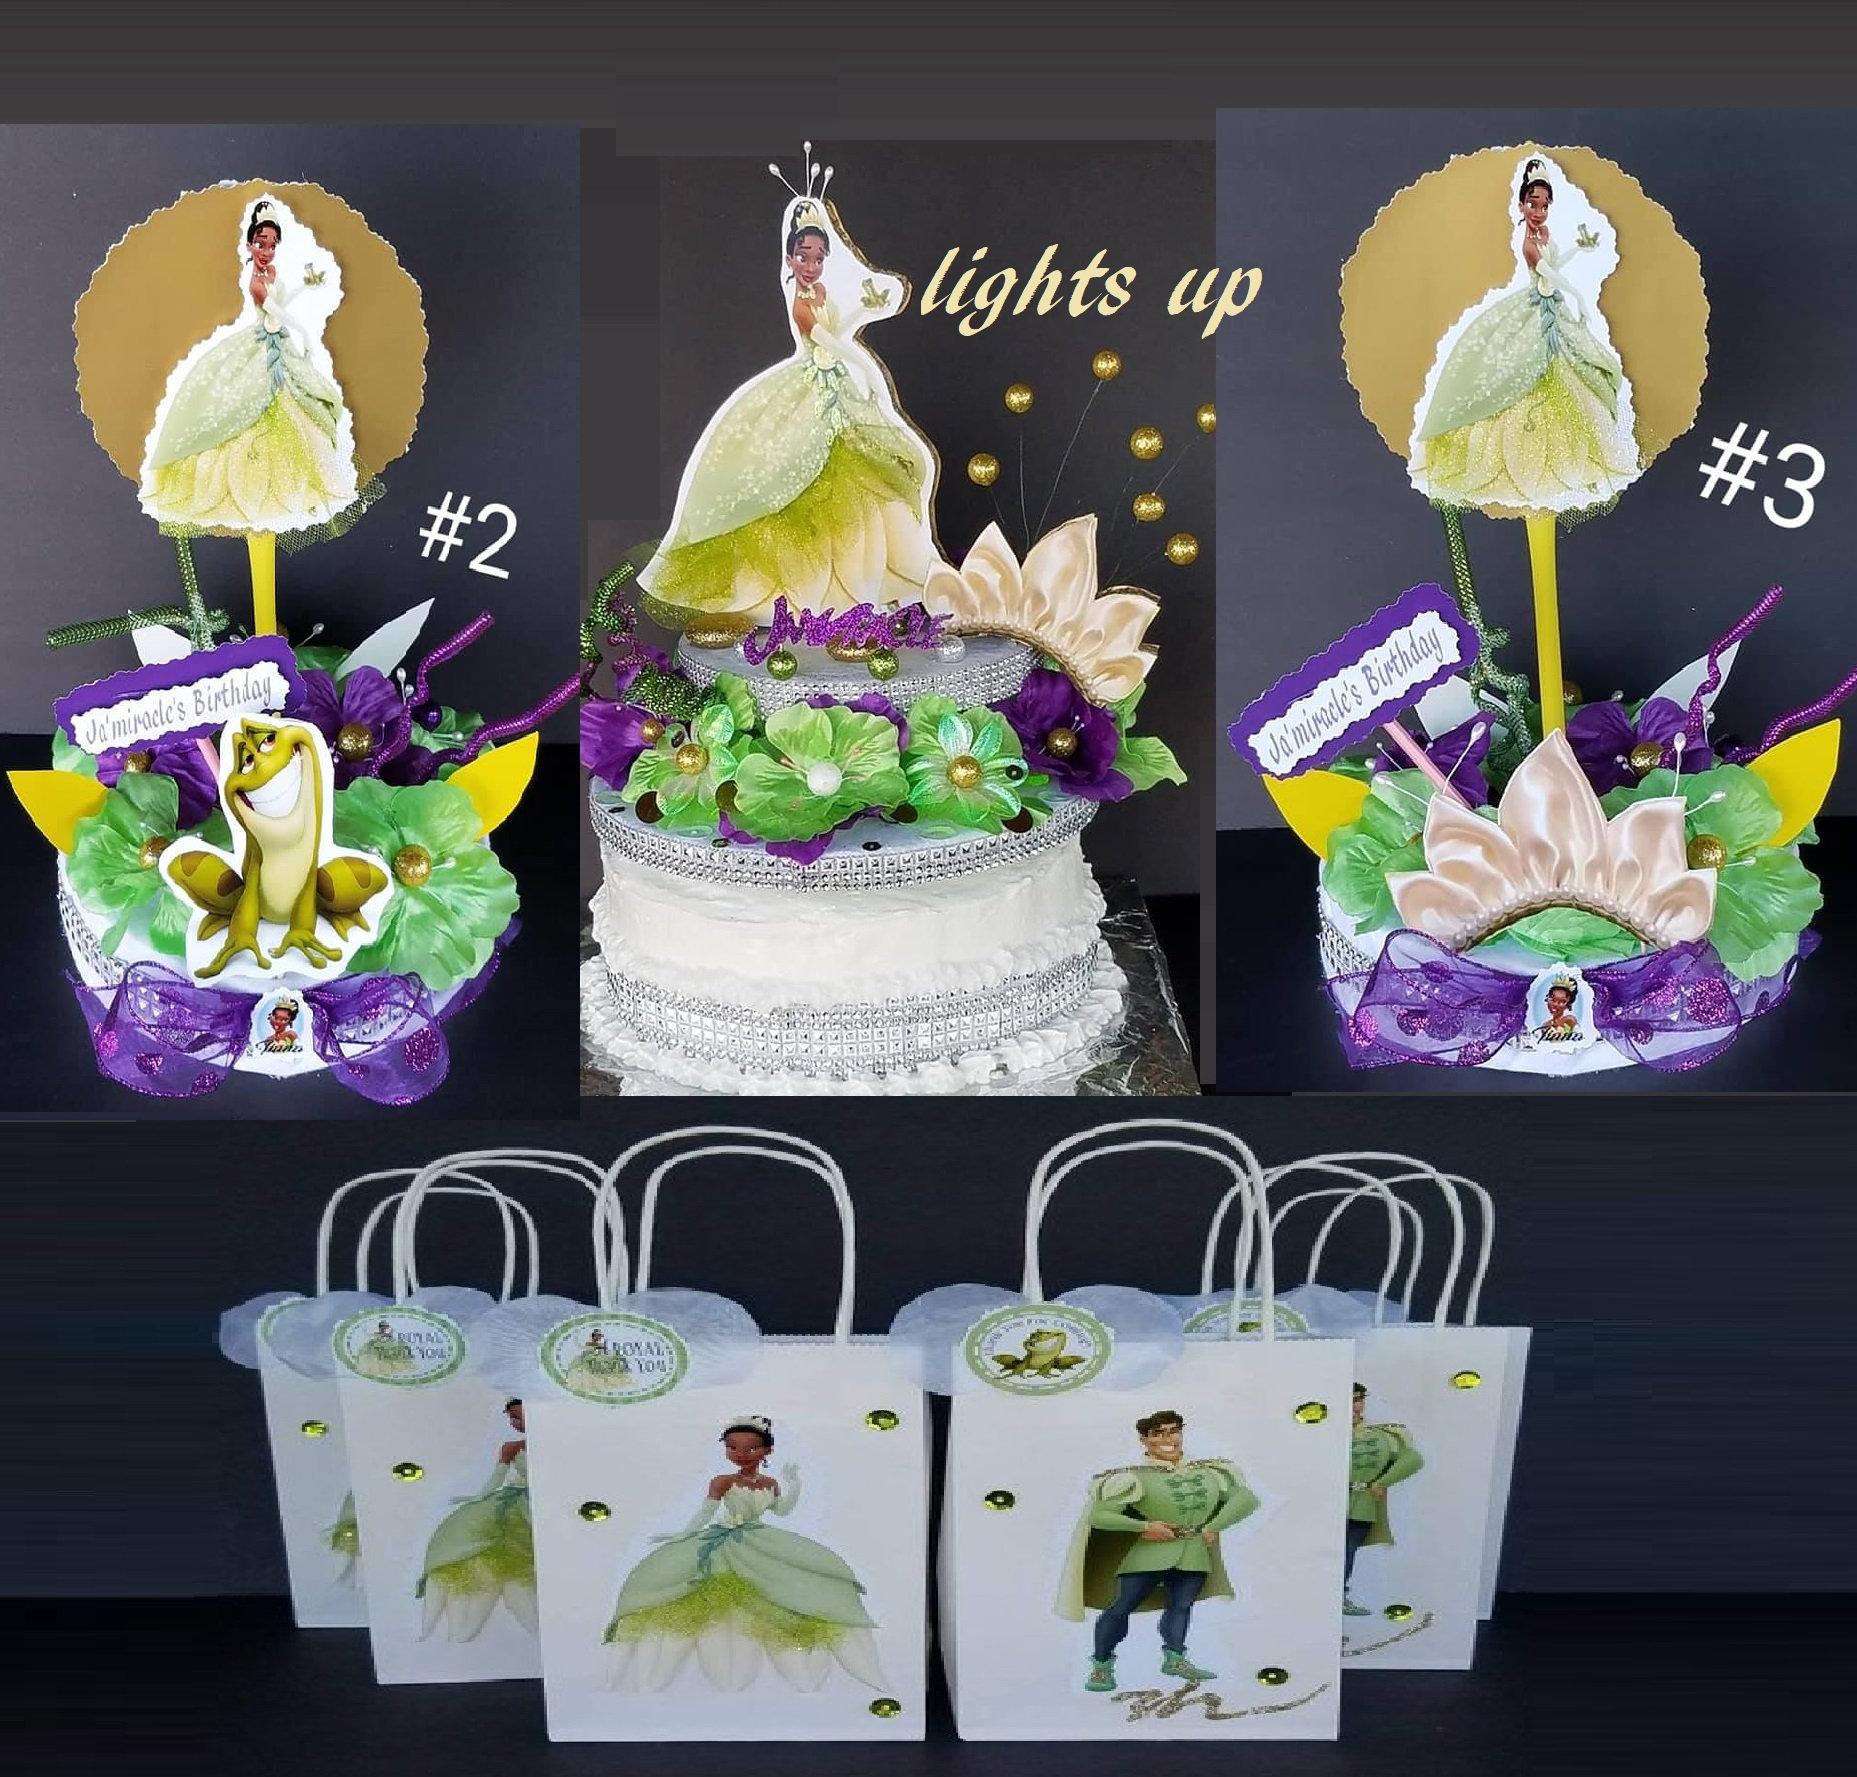 Marvelous Inspired Lights Up Disney Princess Tiana Cake Topper Center Etsy Funny Birthday Cards Online Elaedamsfinfo